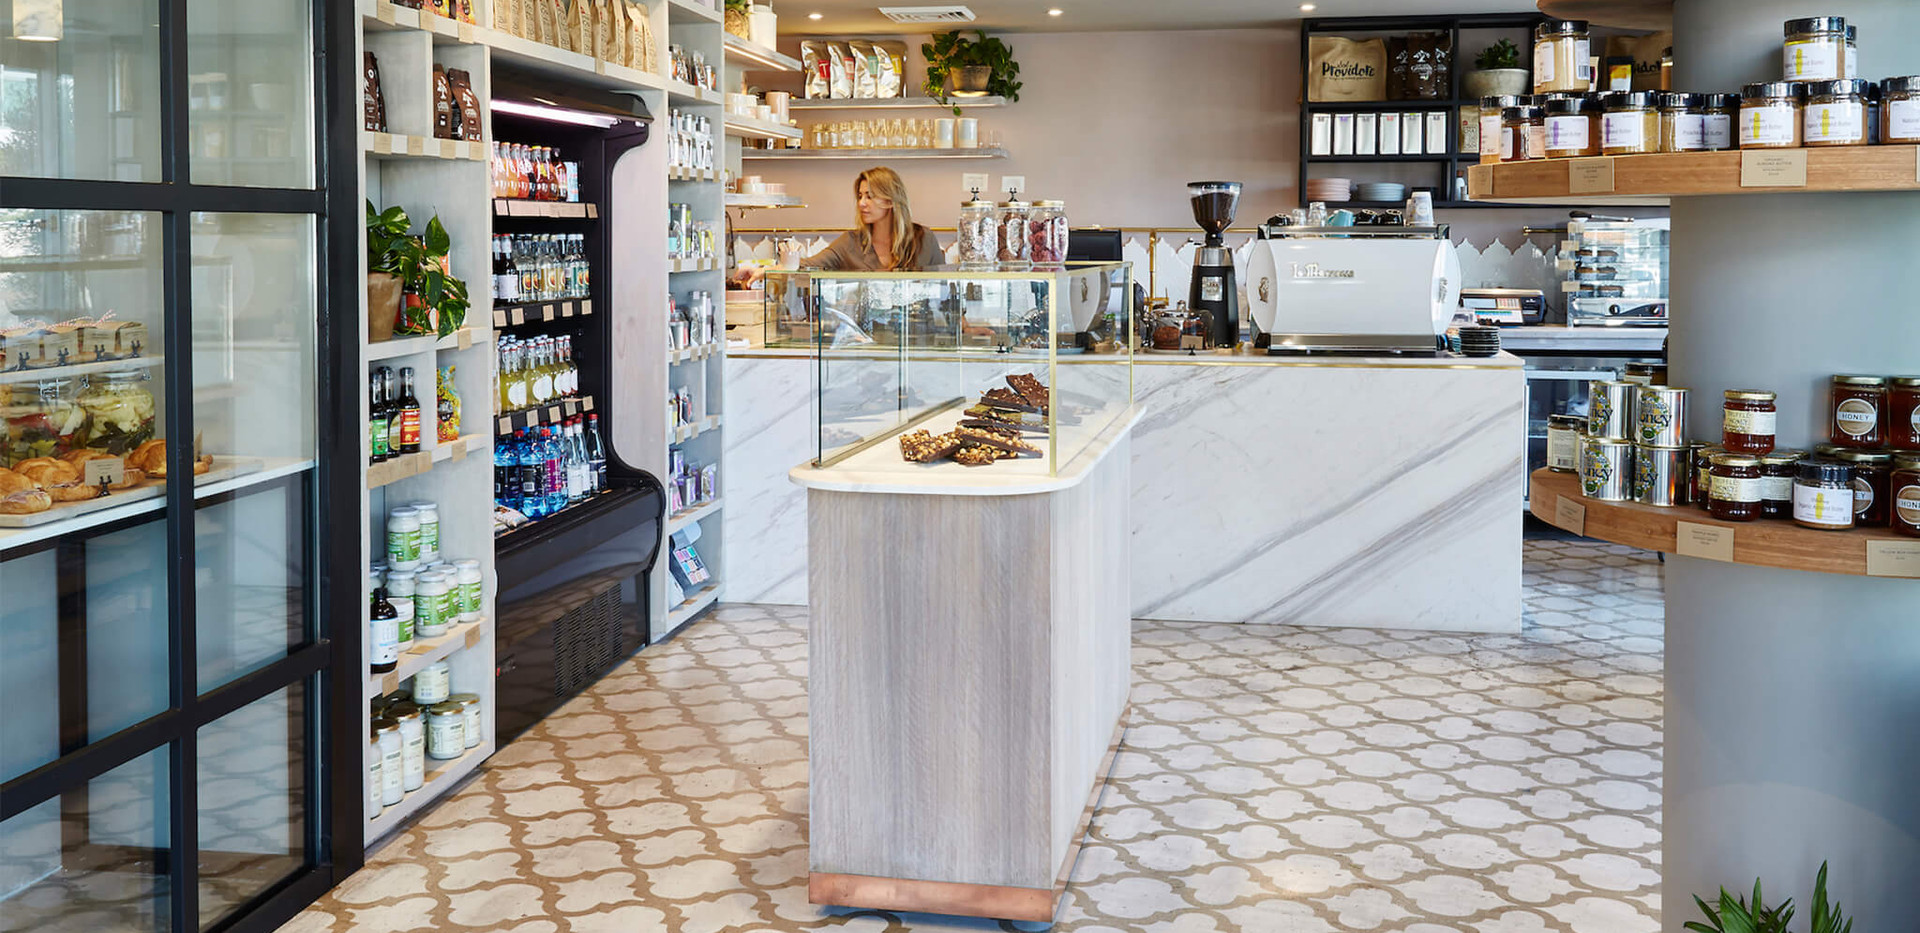 SOL Providore Store - cafe bar design ideas